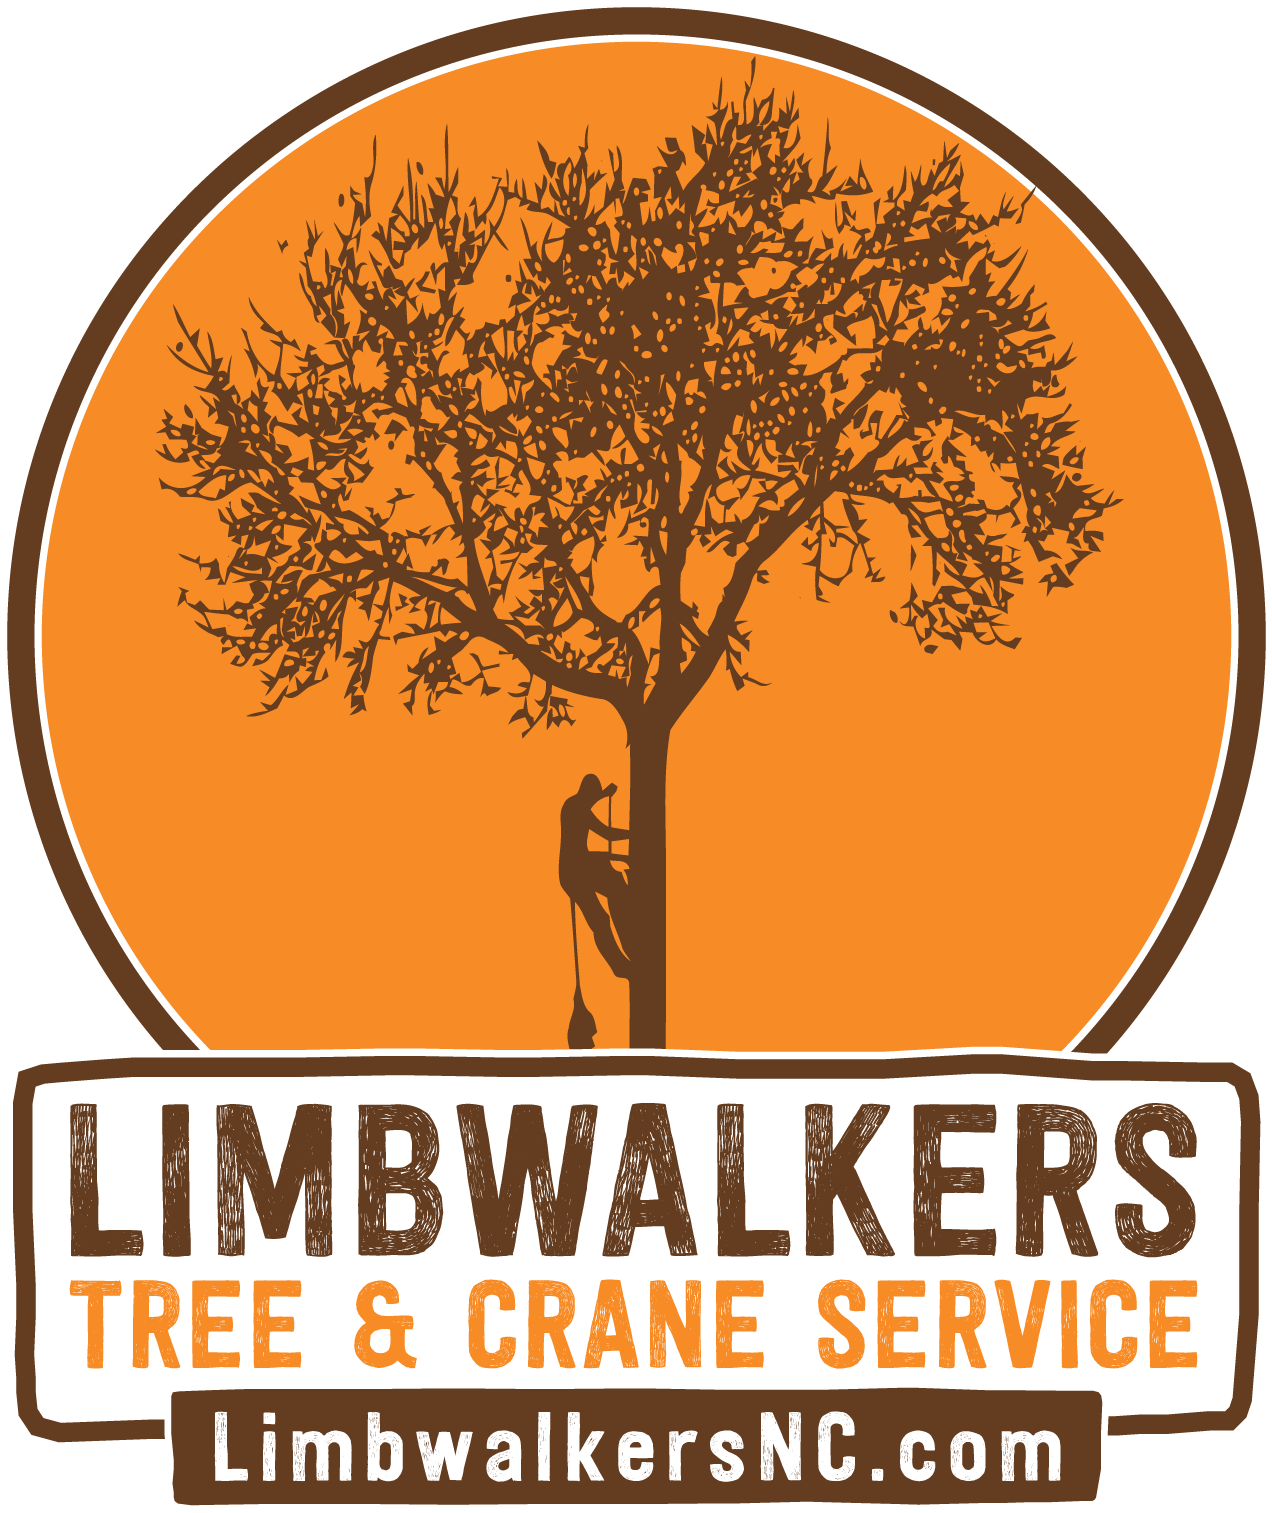 LimbwalkersNC